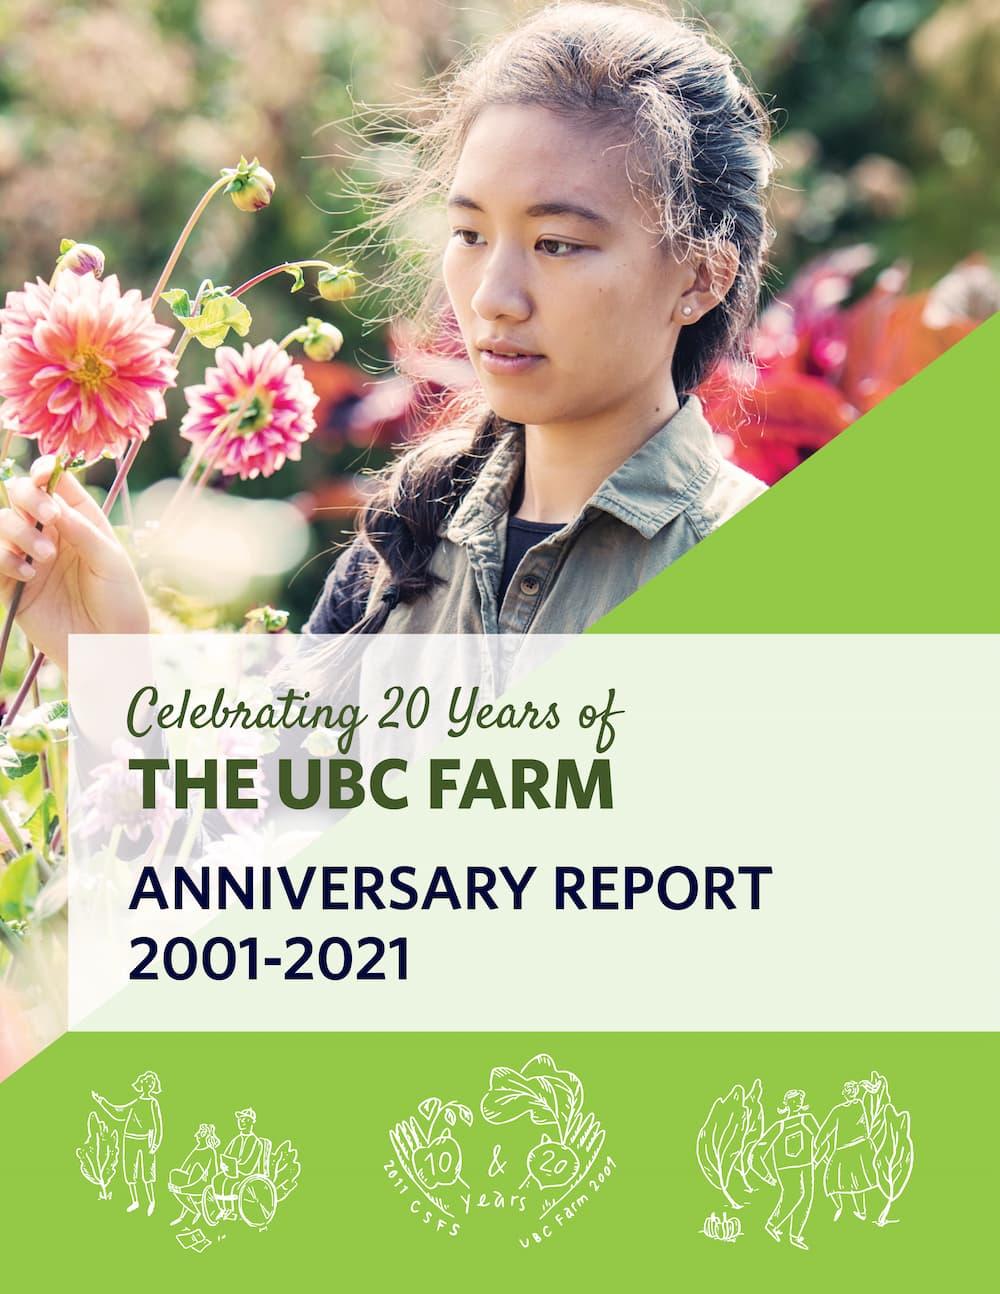 CSFS and UBC Farm Anniversary Report (2001-2021)